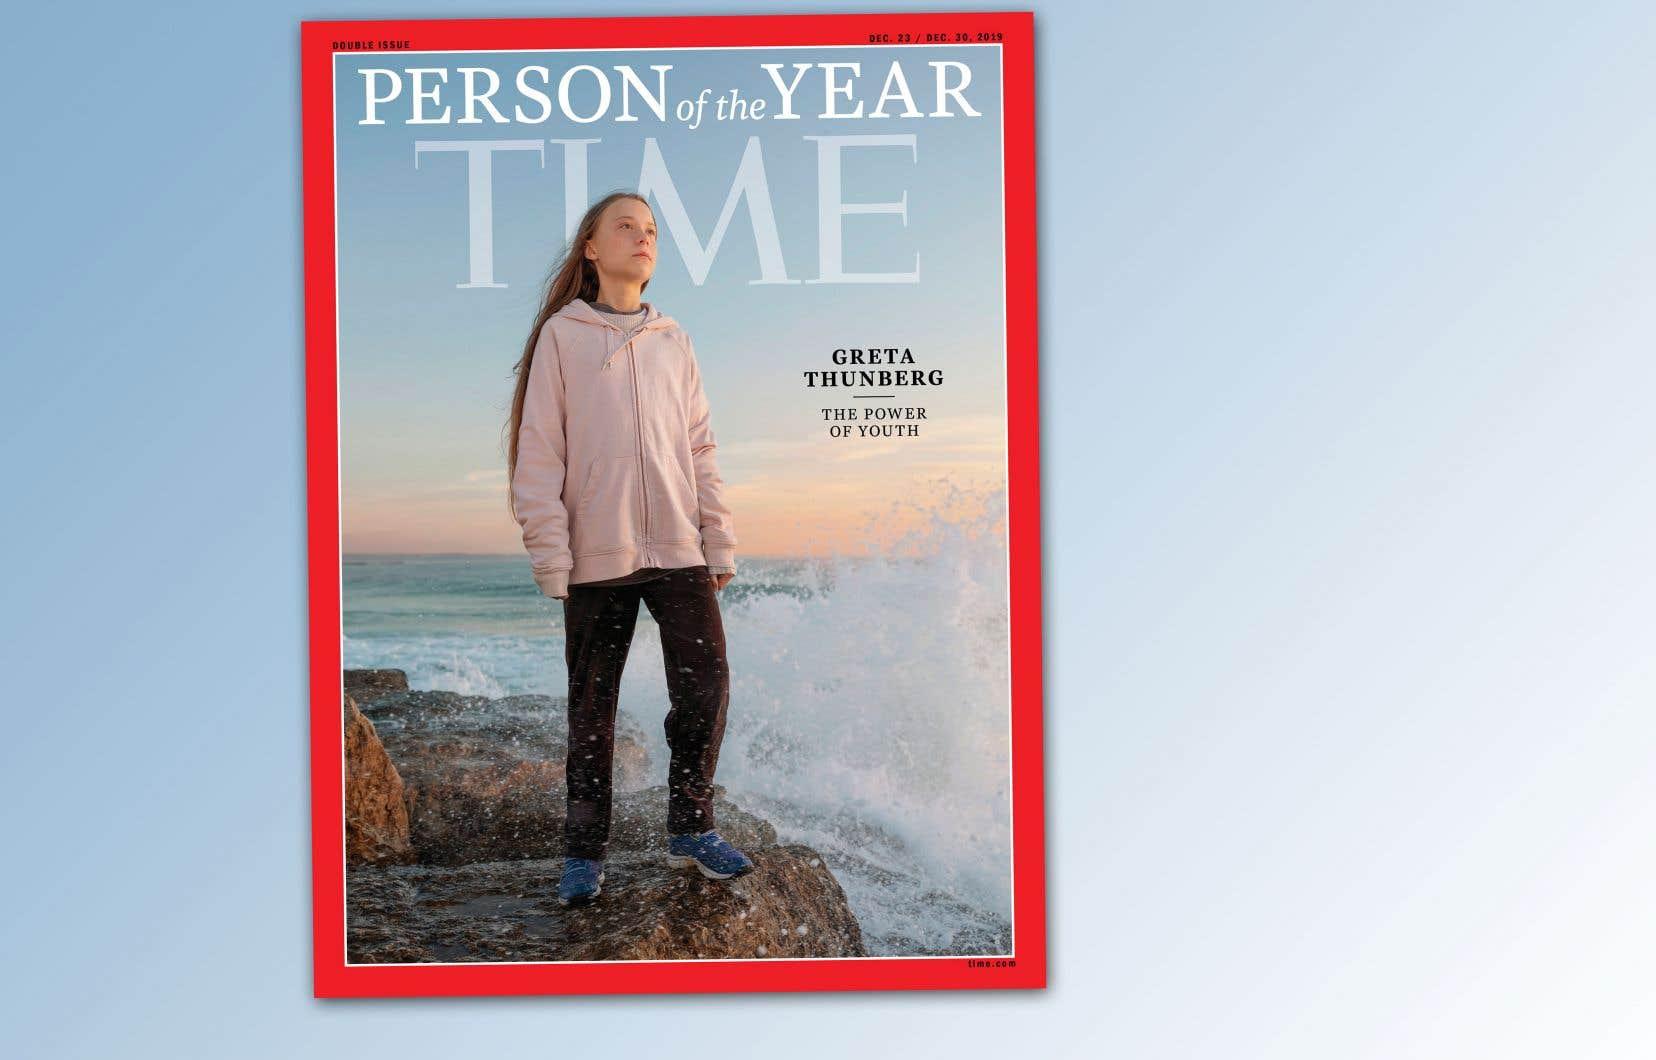 La couverture du magazine «Time» montrant Greta Thunberg